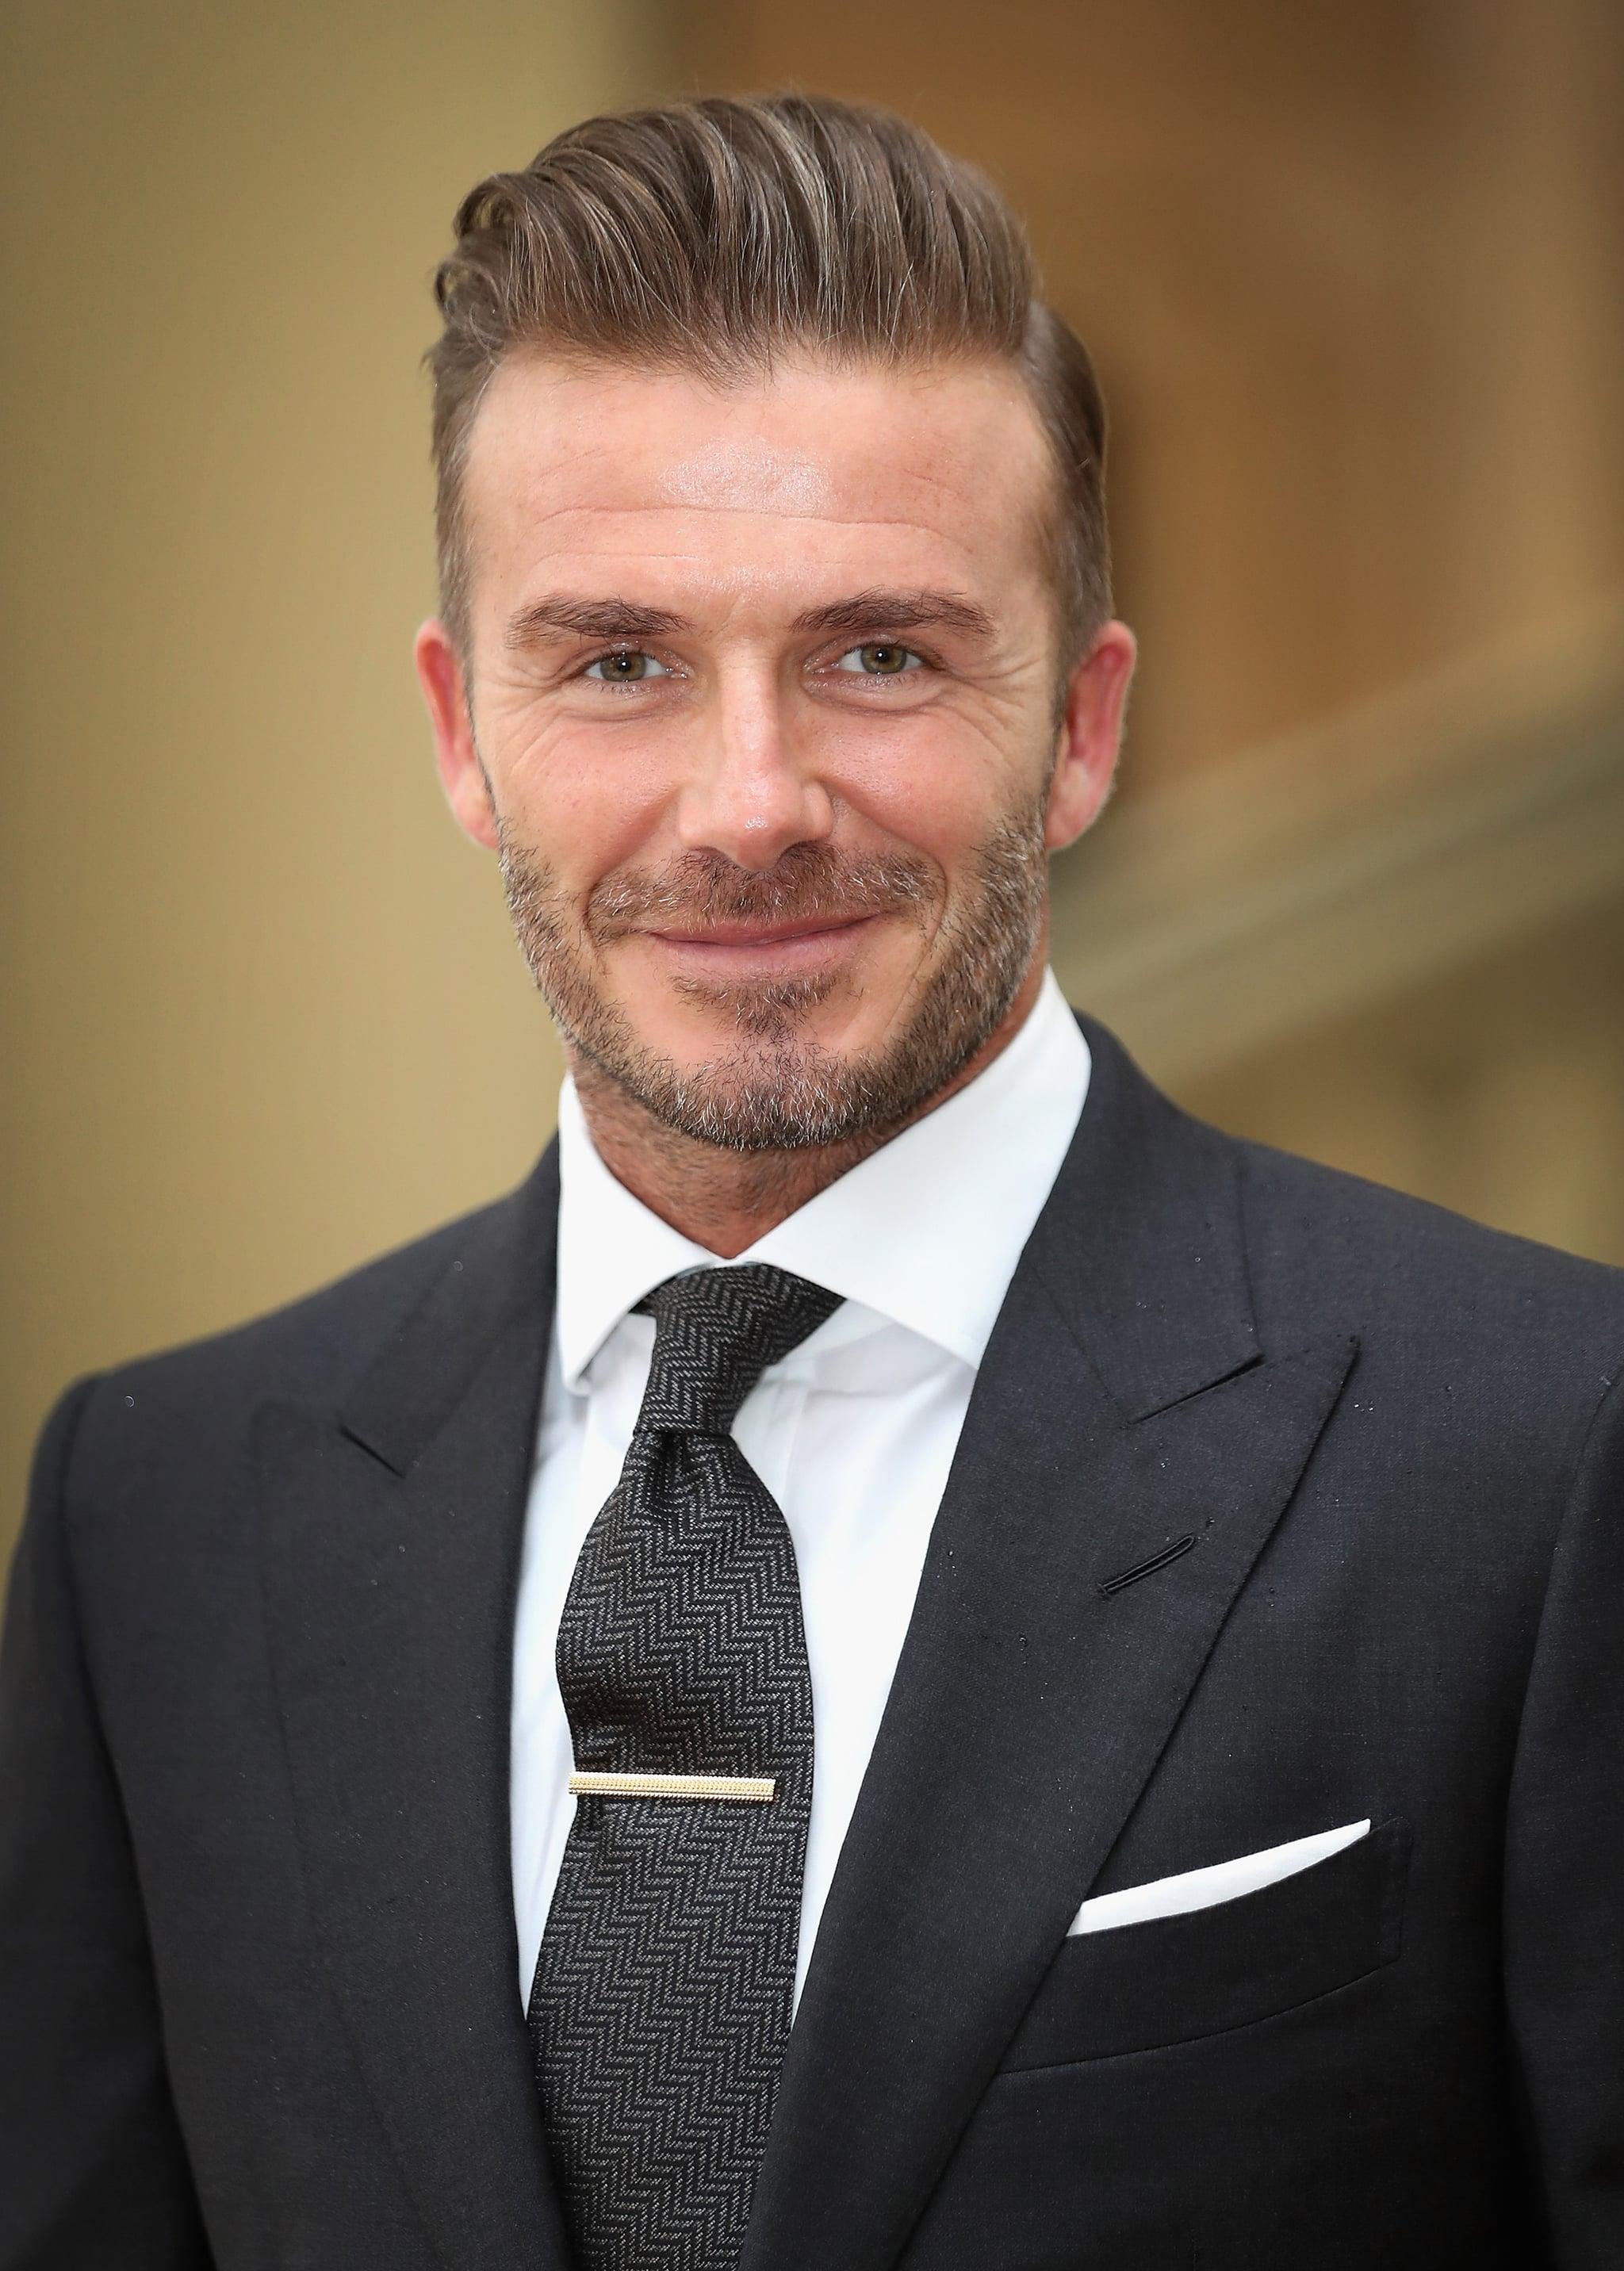 Queen Elizabeth And David Beckham In London June 16 Popsugar Celebrity